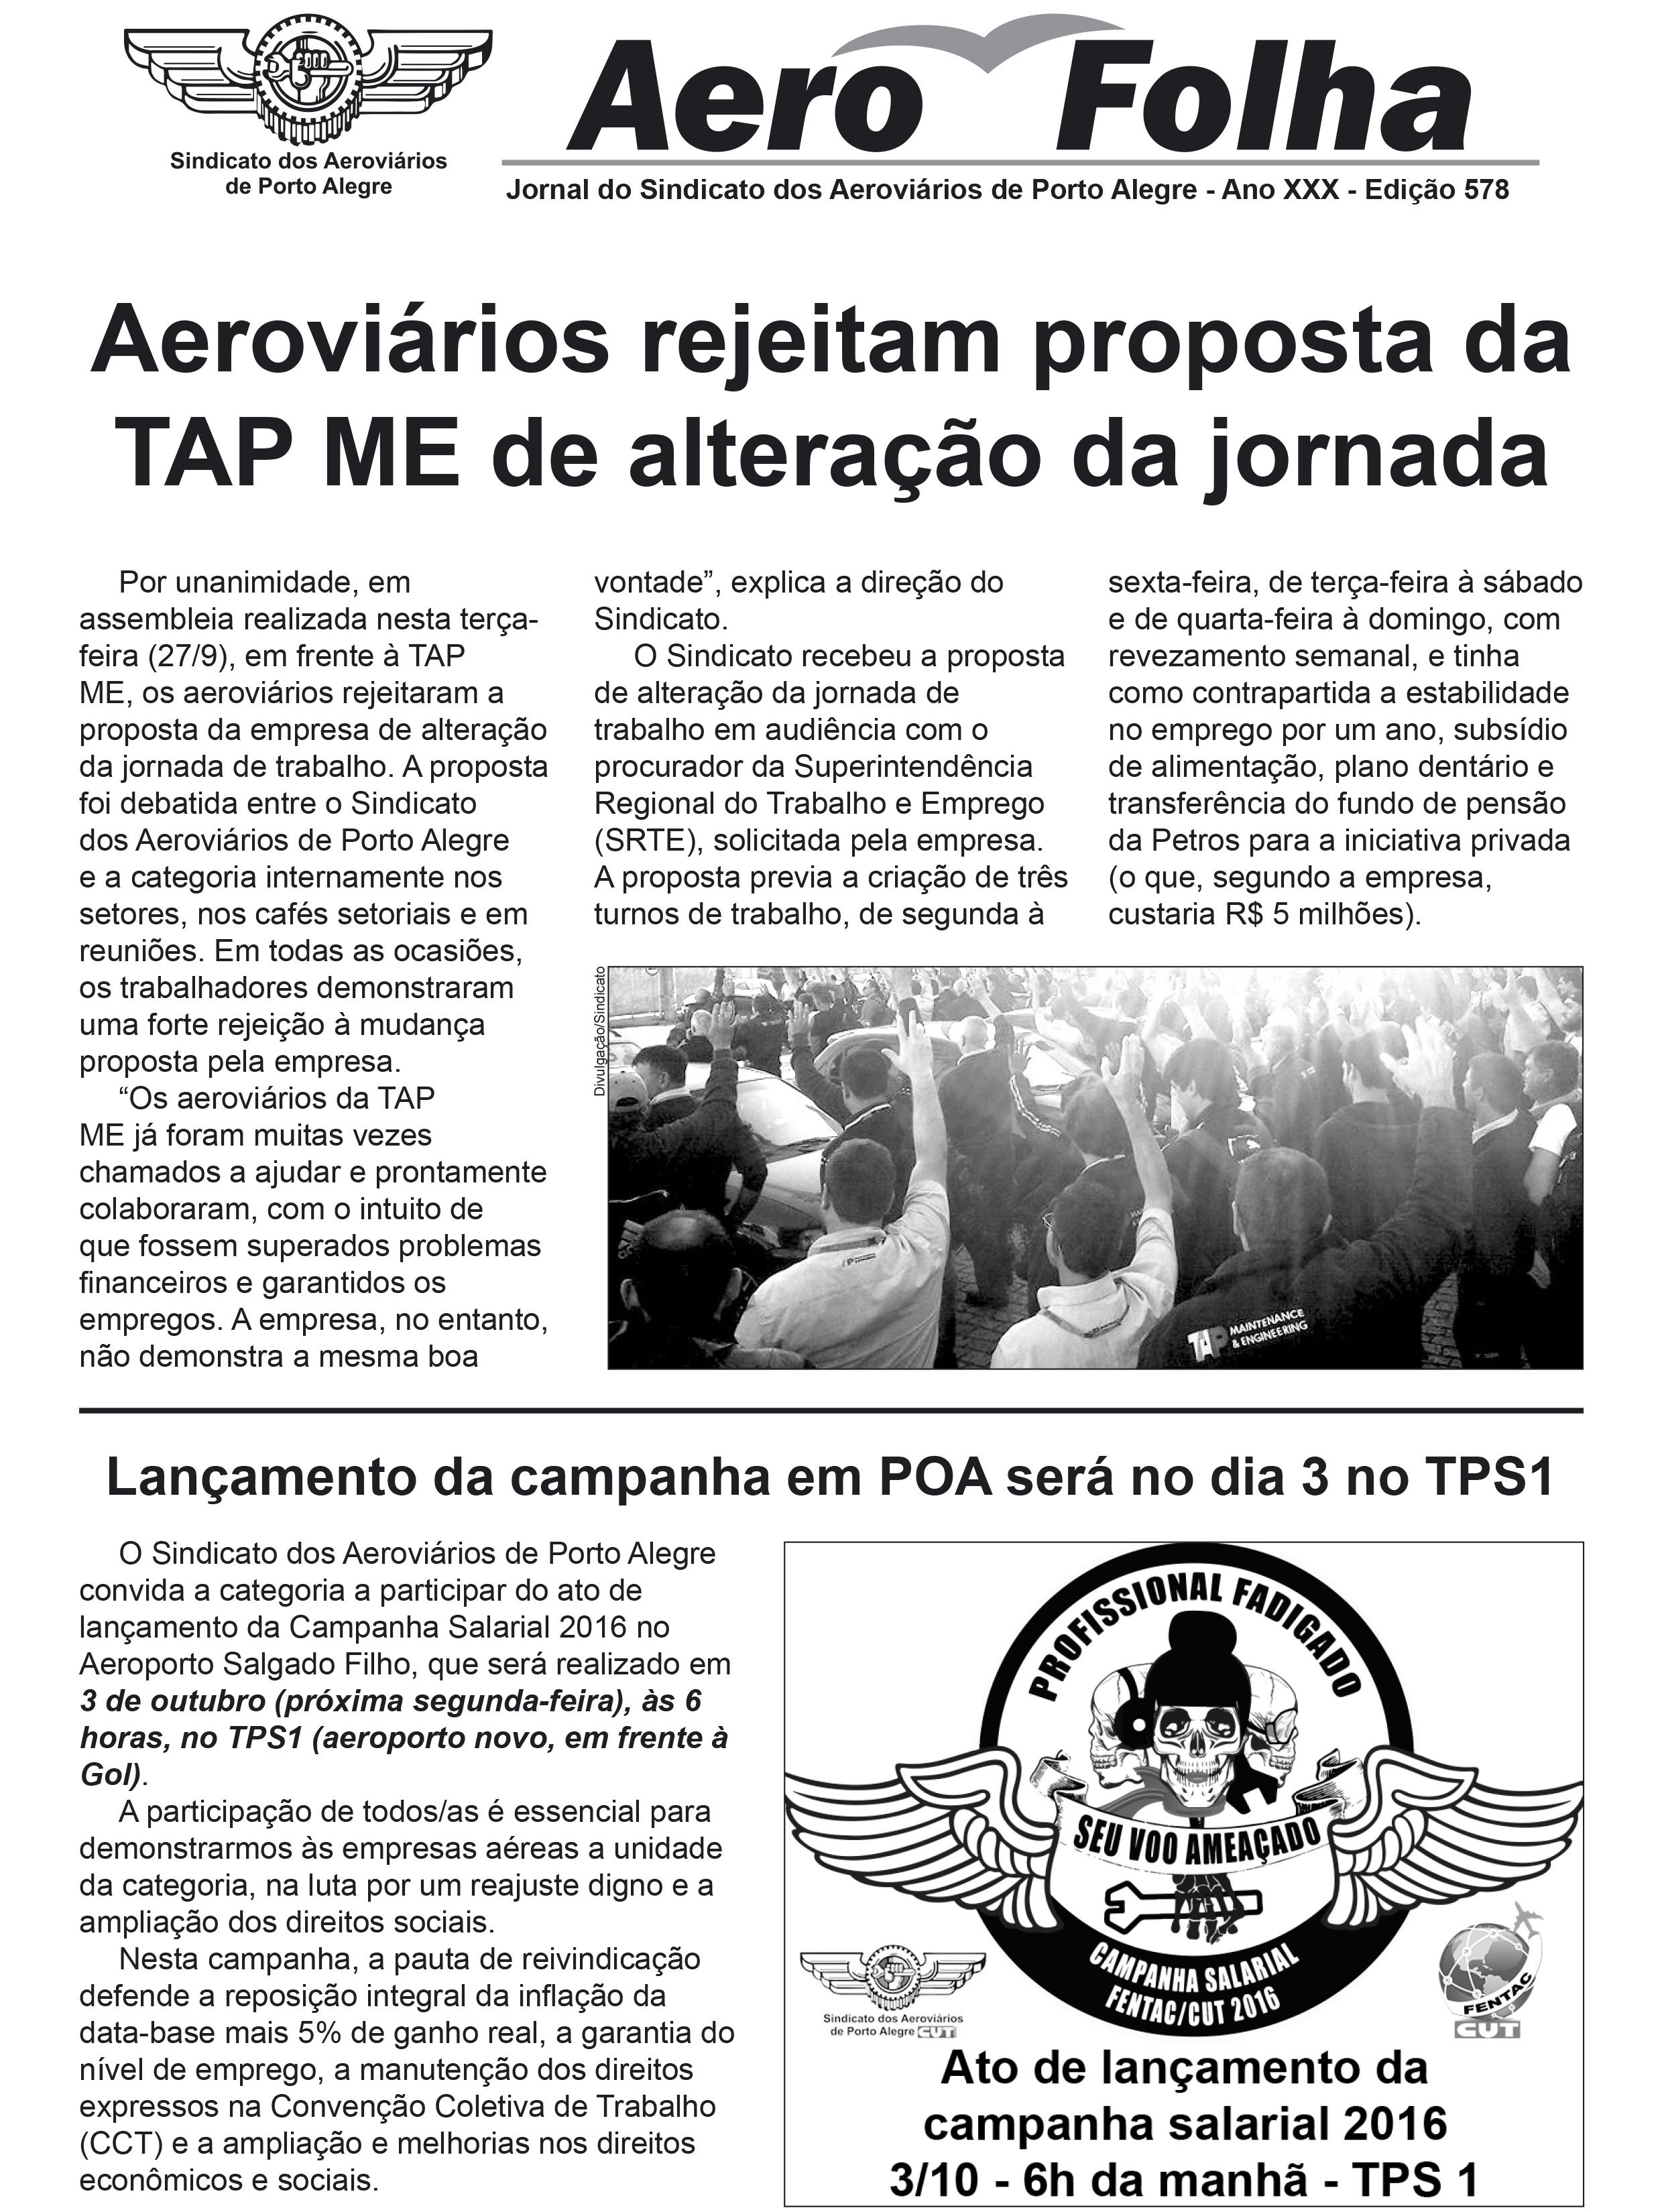 Aerofolha Ed. 578